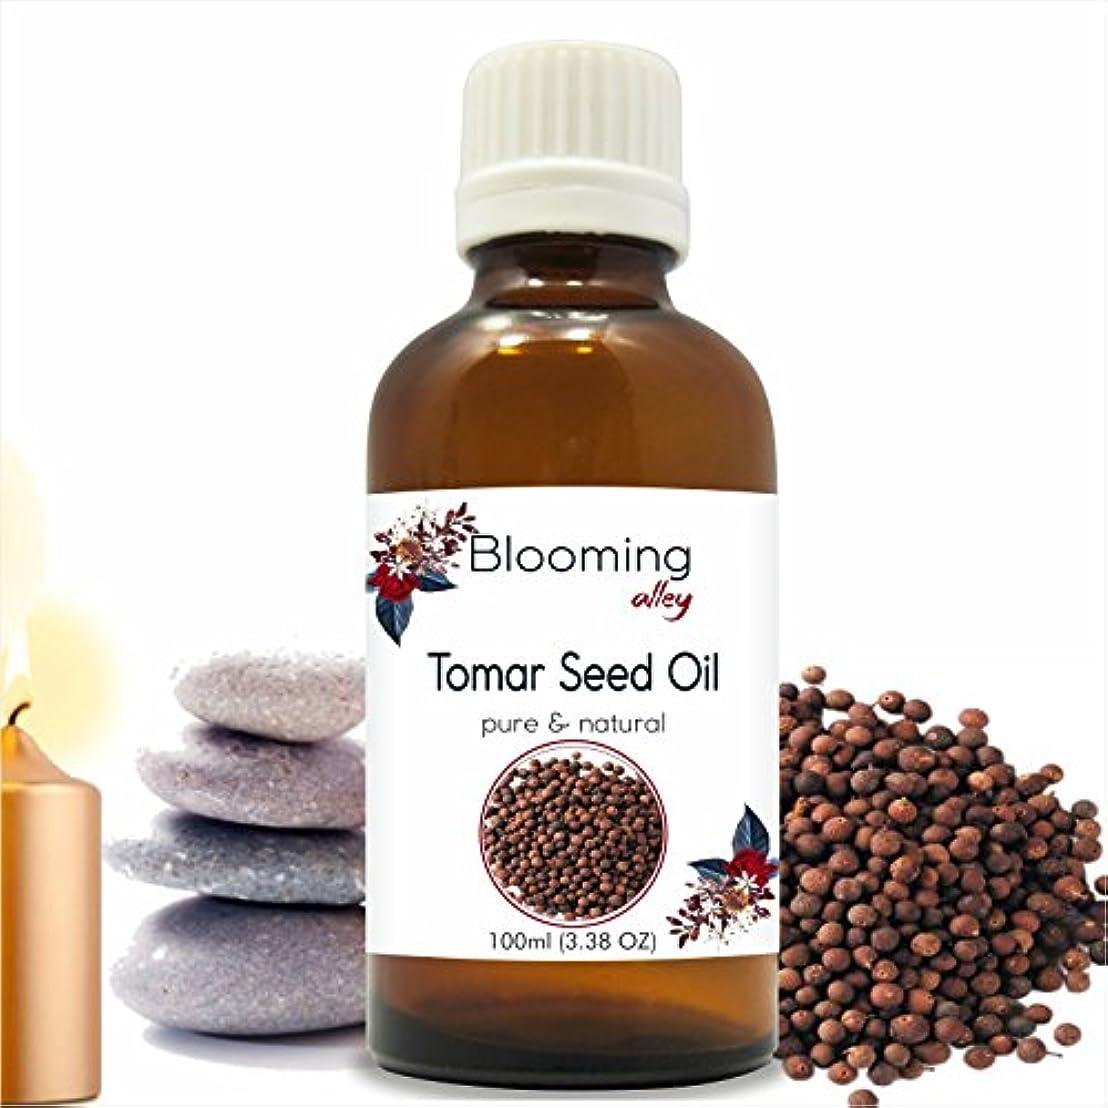 Tomarseed Oil(Zanthozylum Armathum) Essential Oil 100 ml or 3.38 Fl Oz by Blooming Alley